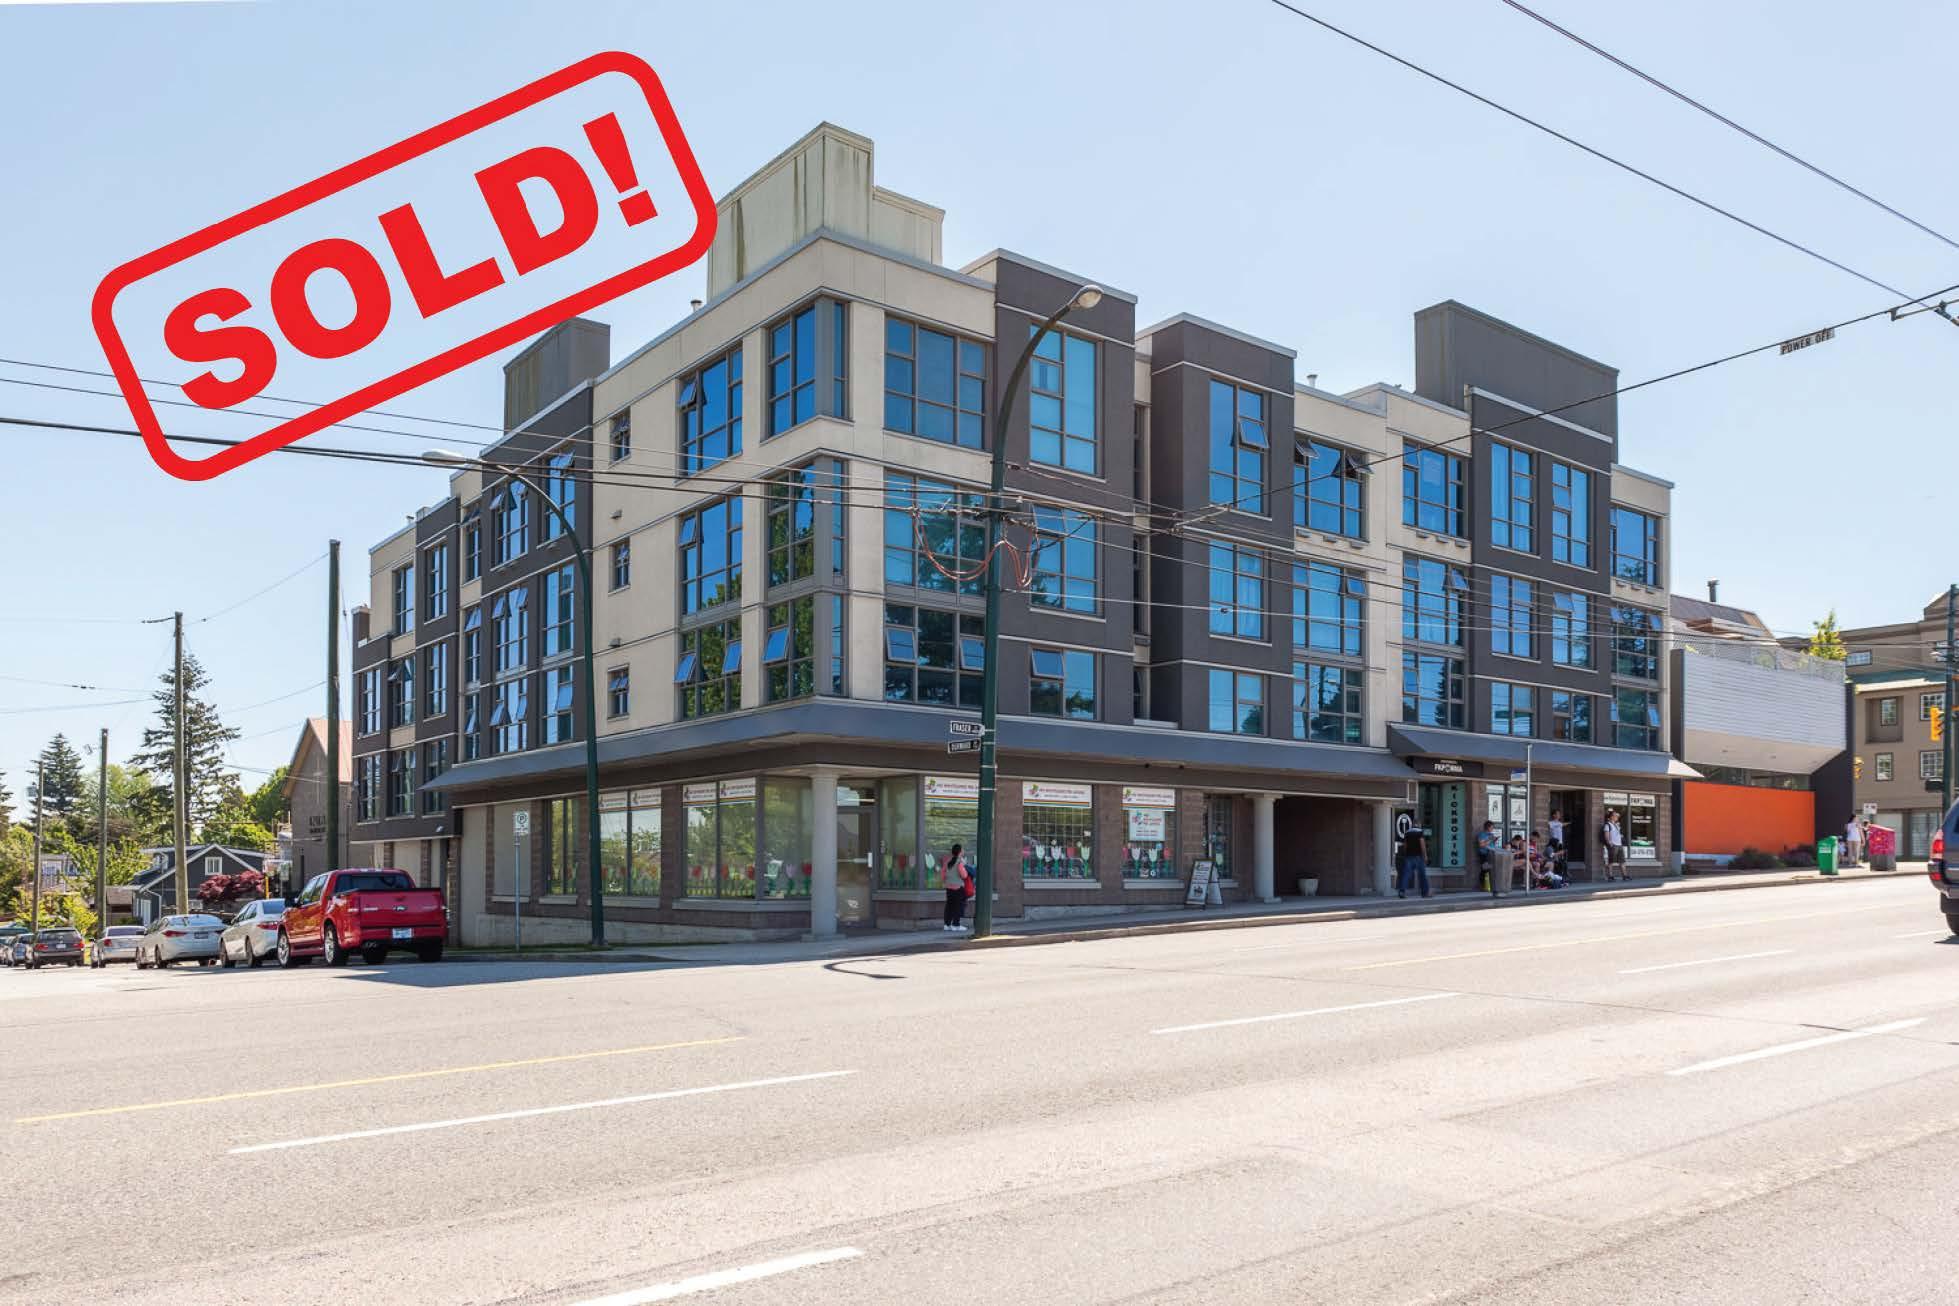 207-4868 Fraser Street   Sold foR: $446,750  1 Bed | 1 Bath | 589 SF